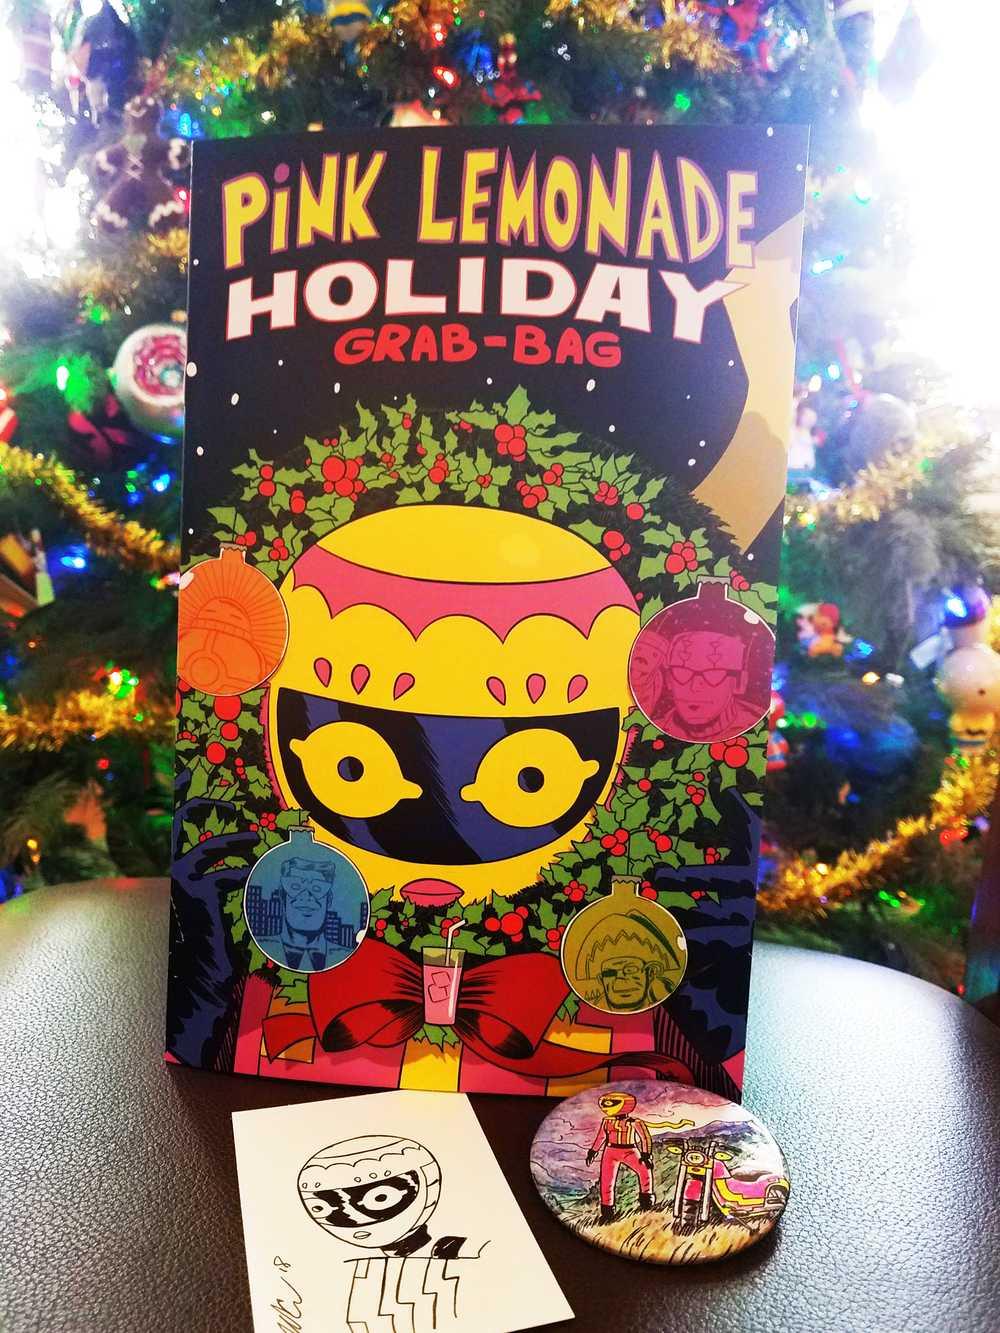 Image of Pink Lemonade Holiday Grab-Bag